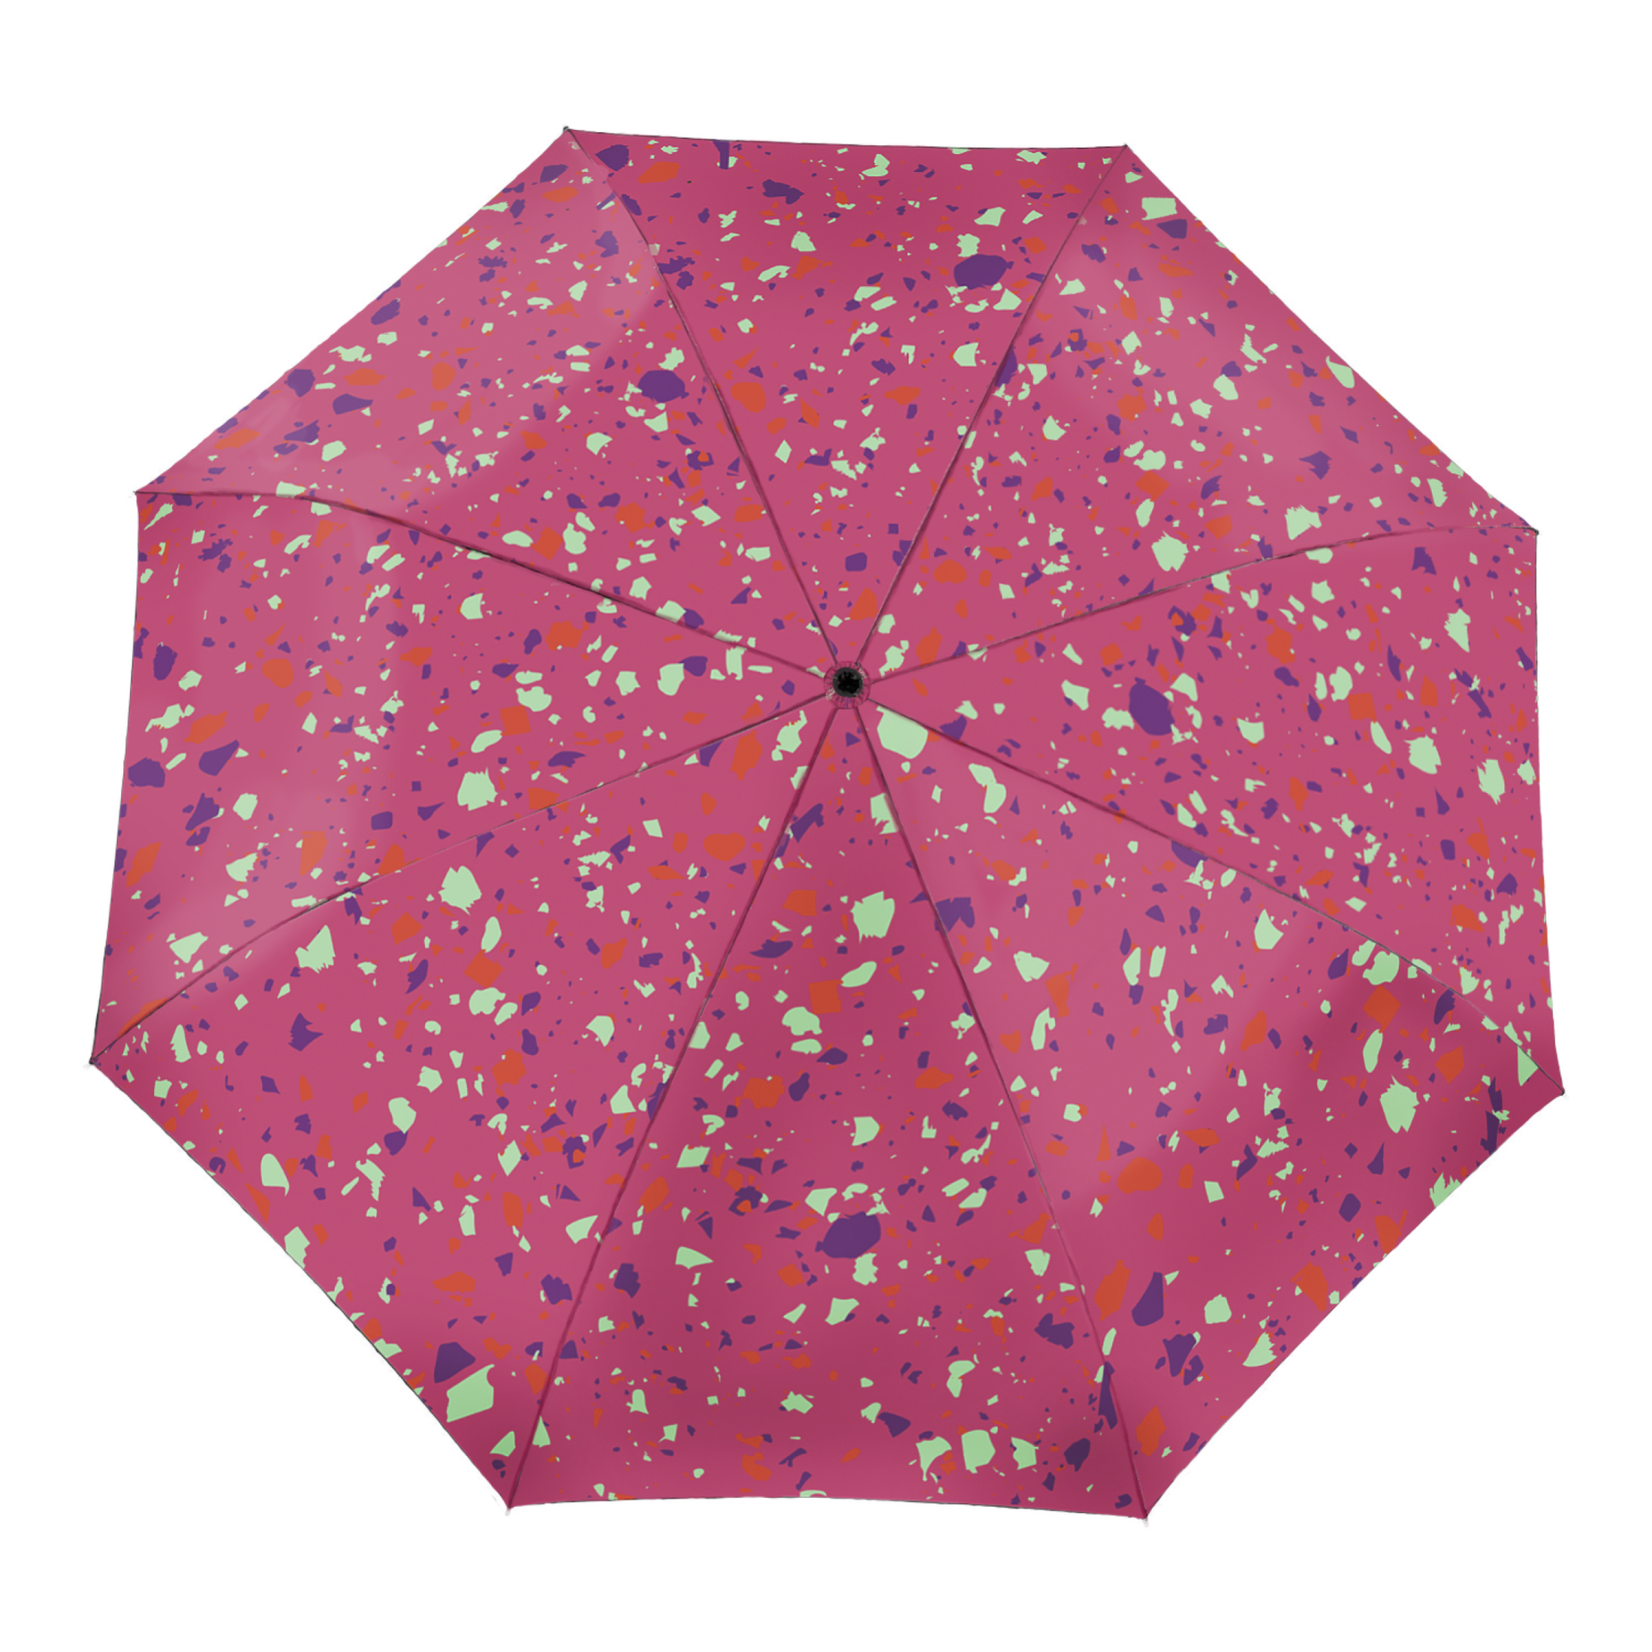 Original Duckhead Original Duckhead Terraz-Wow in Pink Compact Umbrella